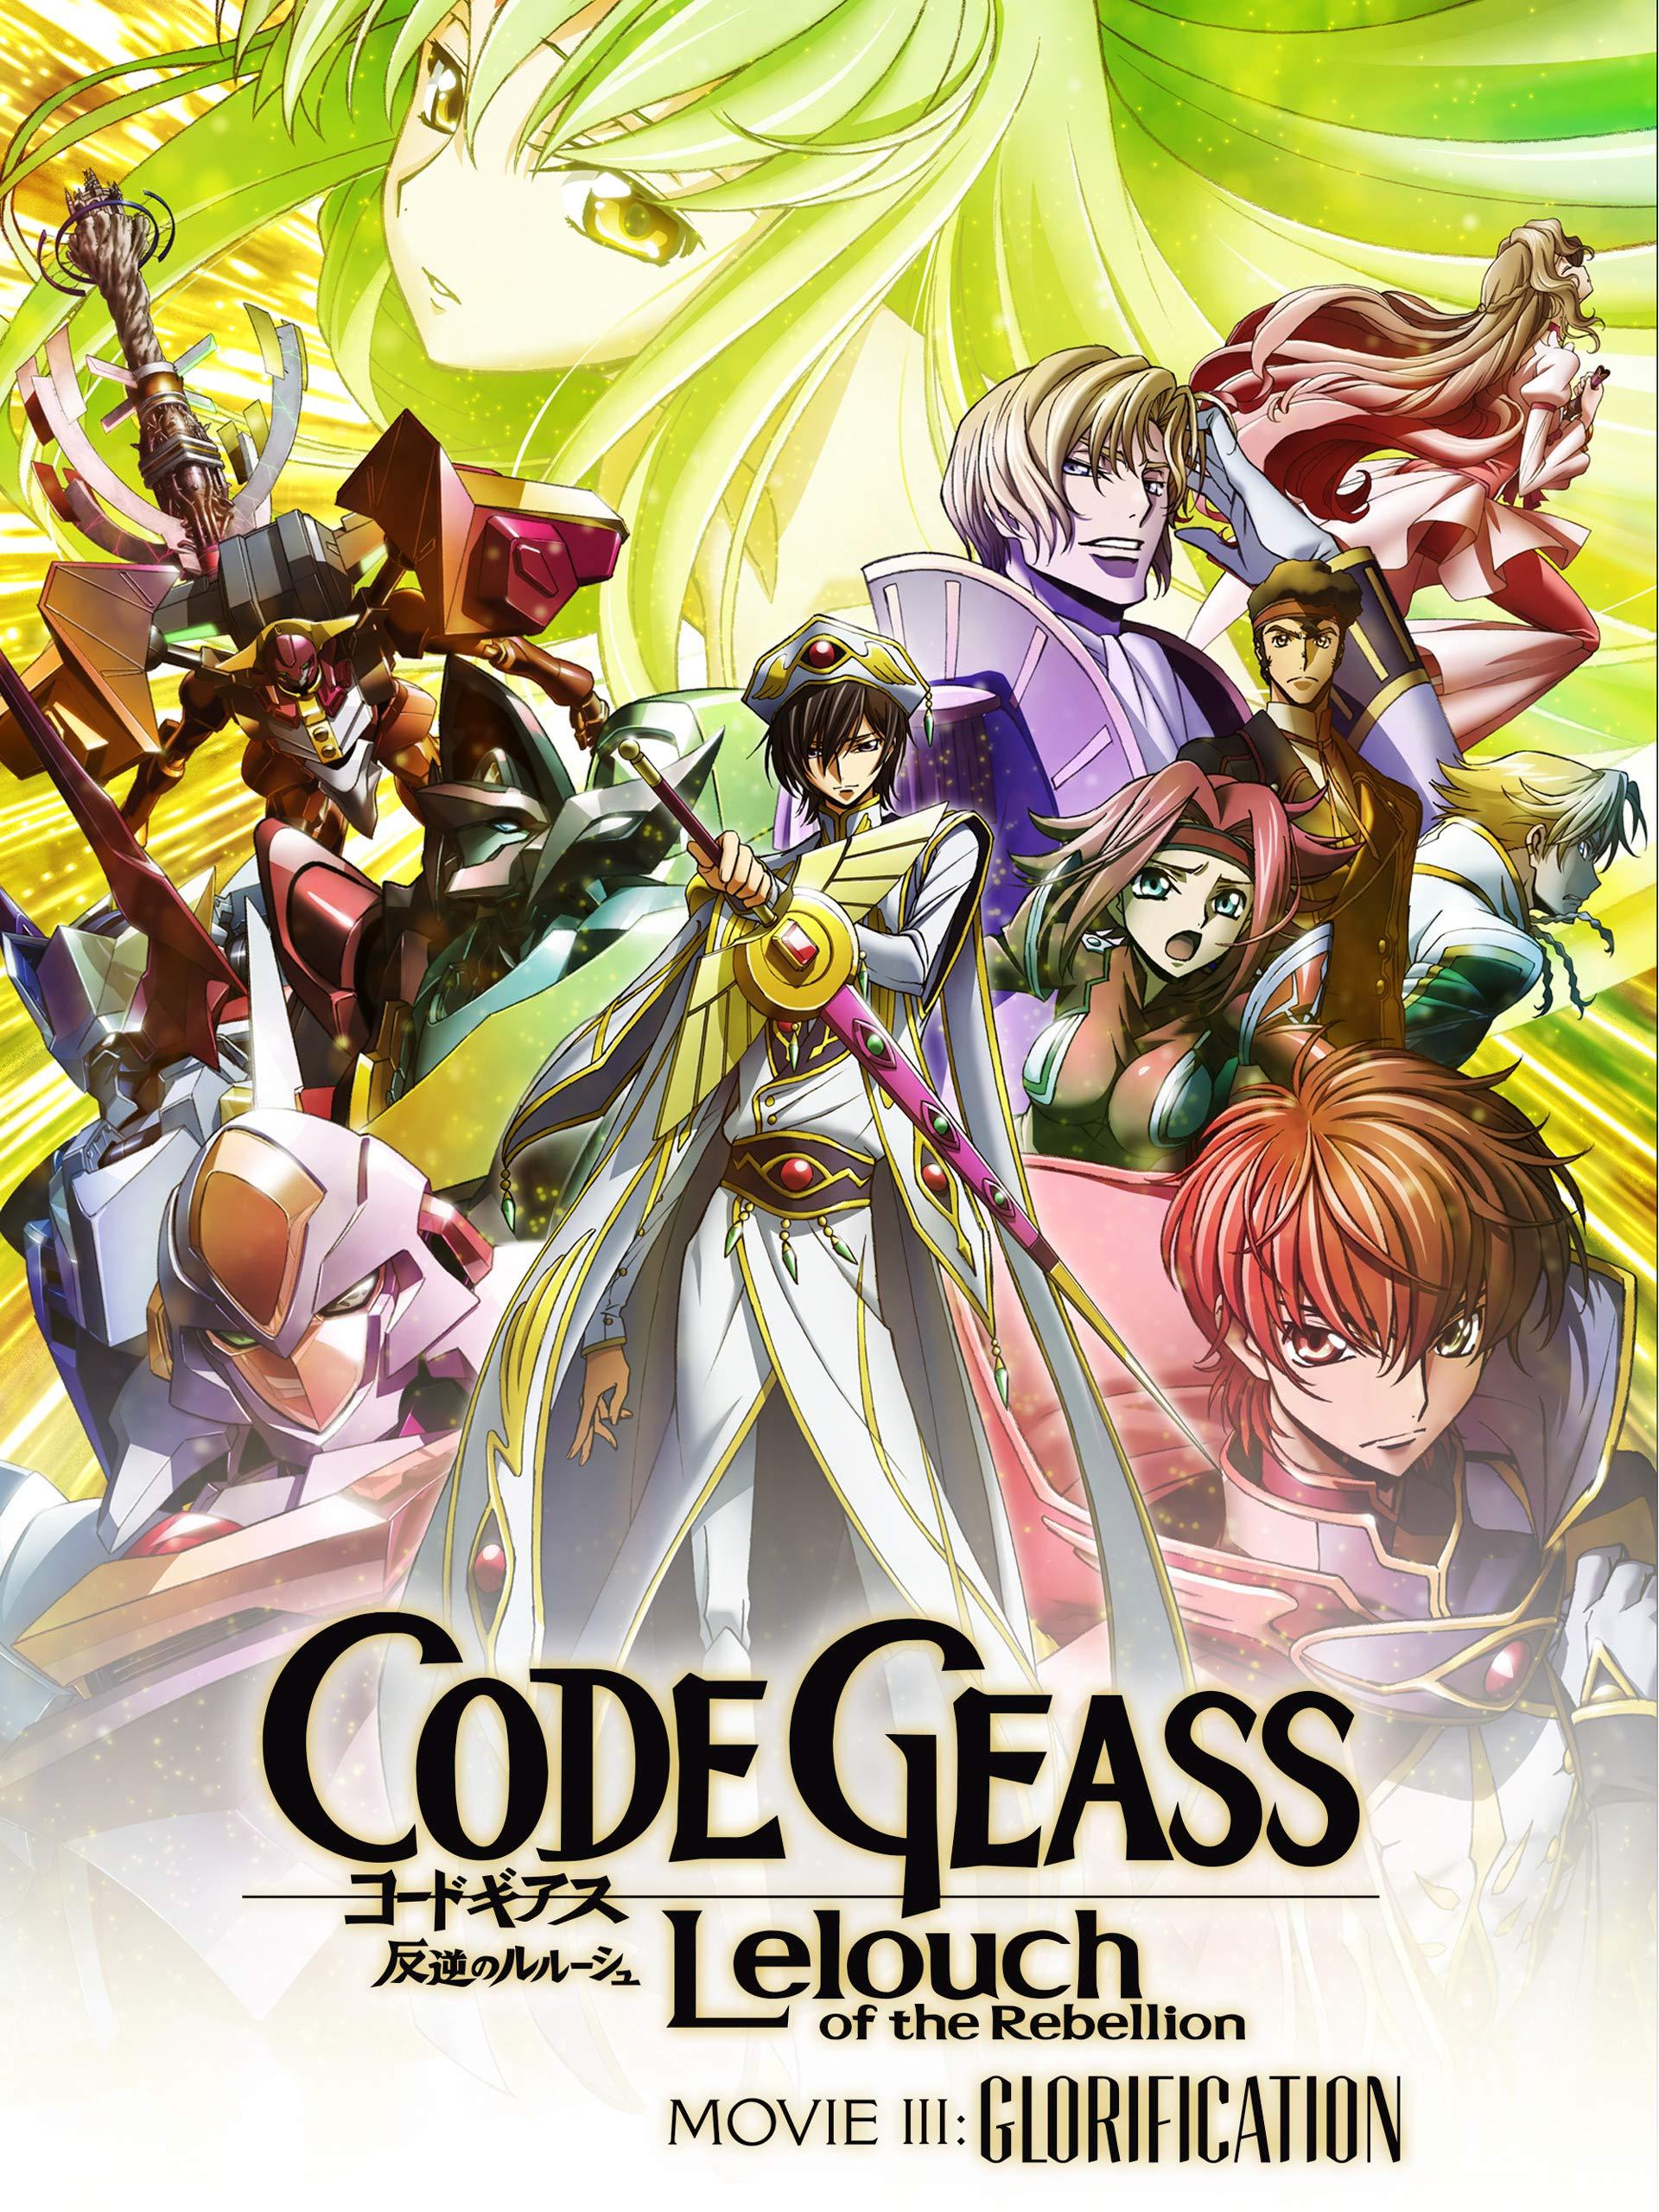 Code Geass: Lelouch of the Rebellion III — Glorification